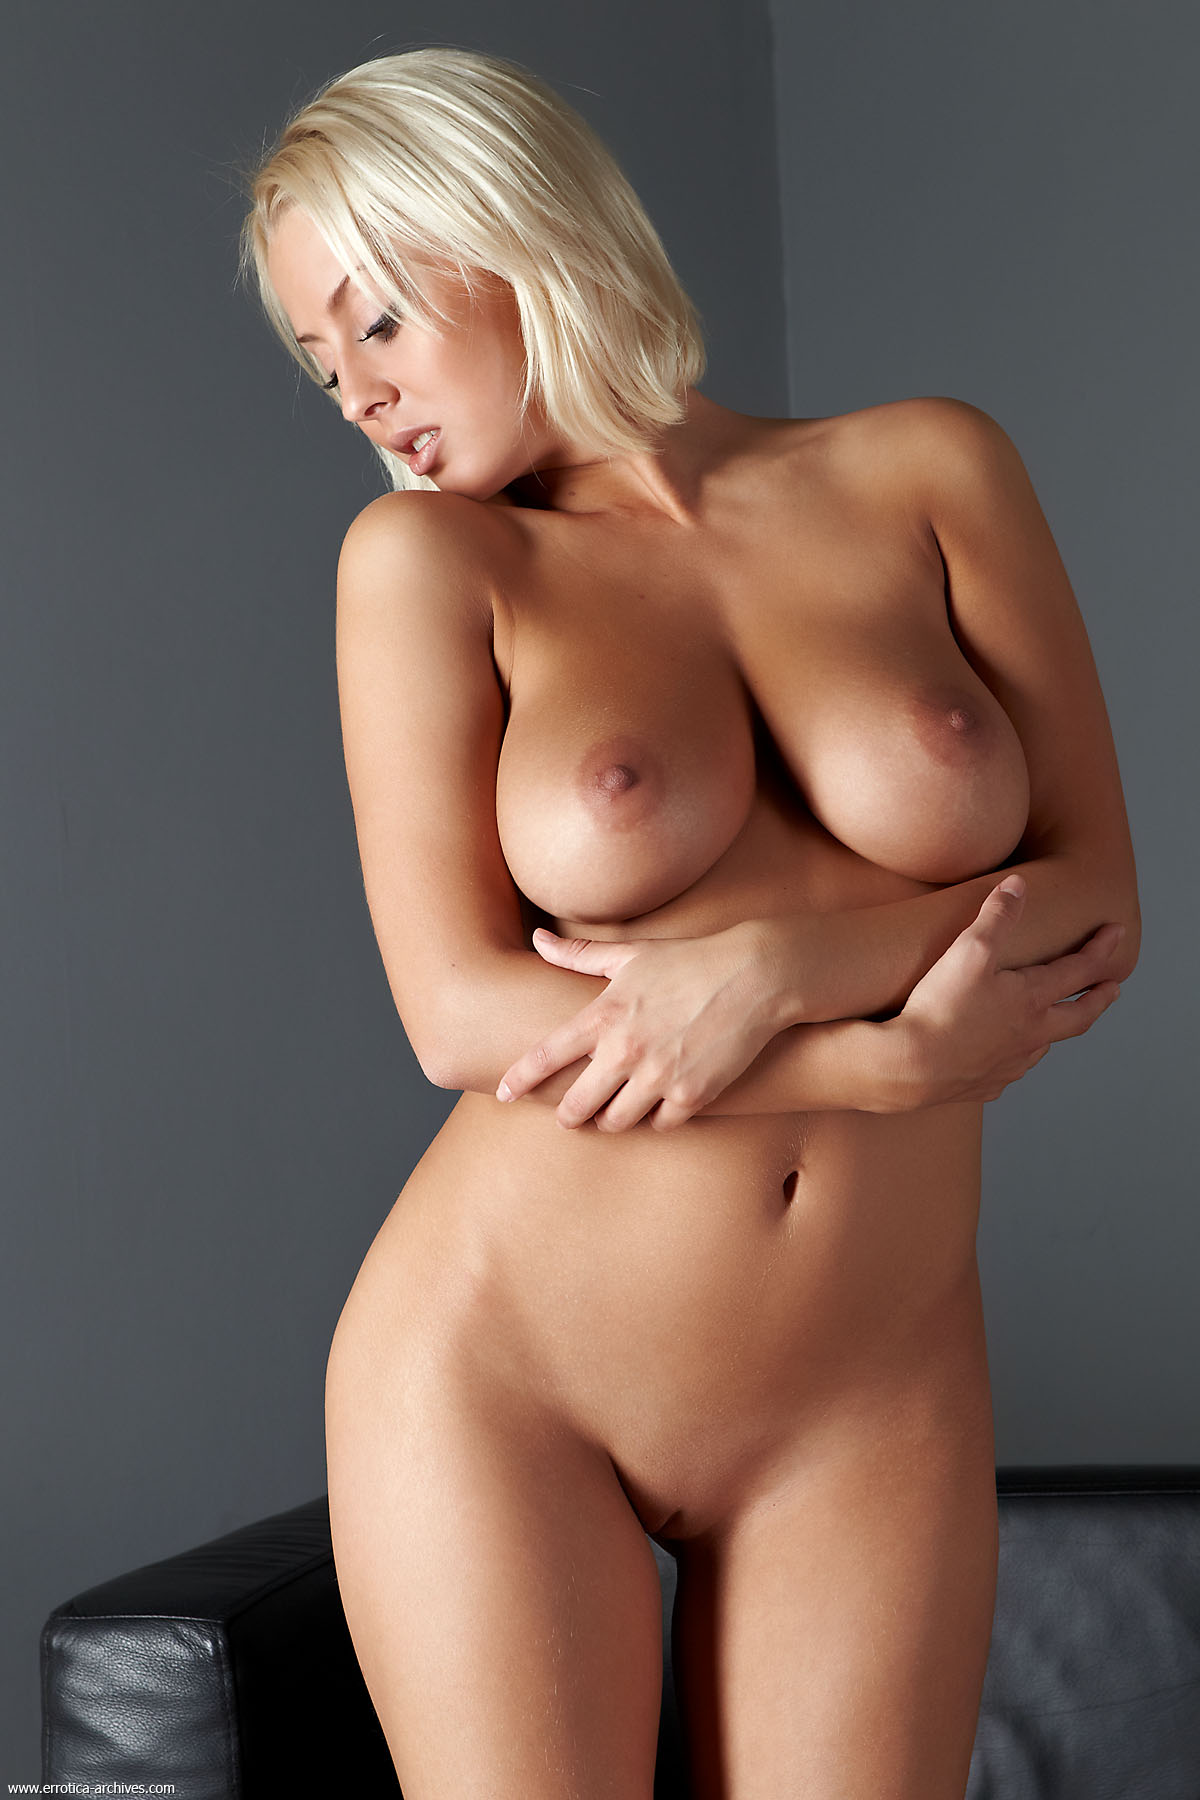 nude-blonde-girls-boobs-mix-vol7-03